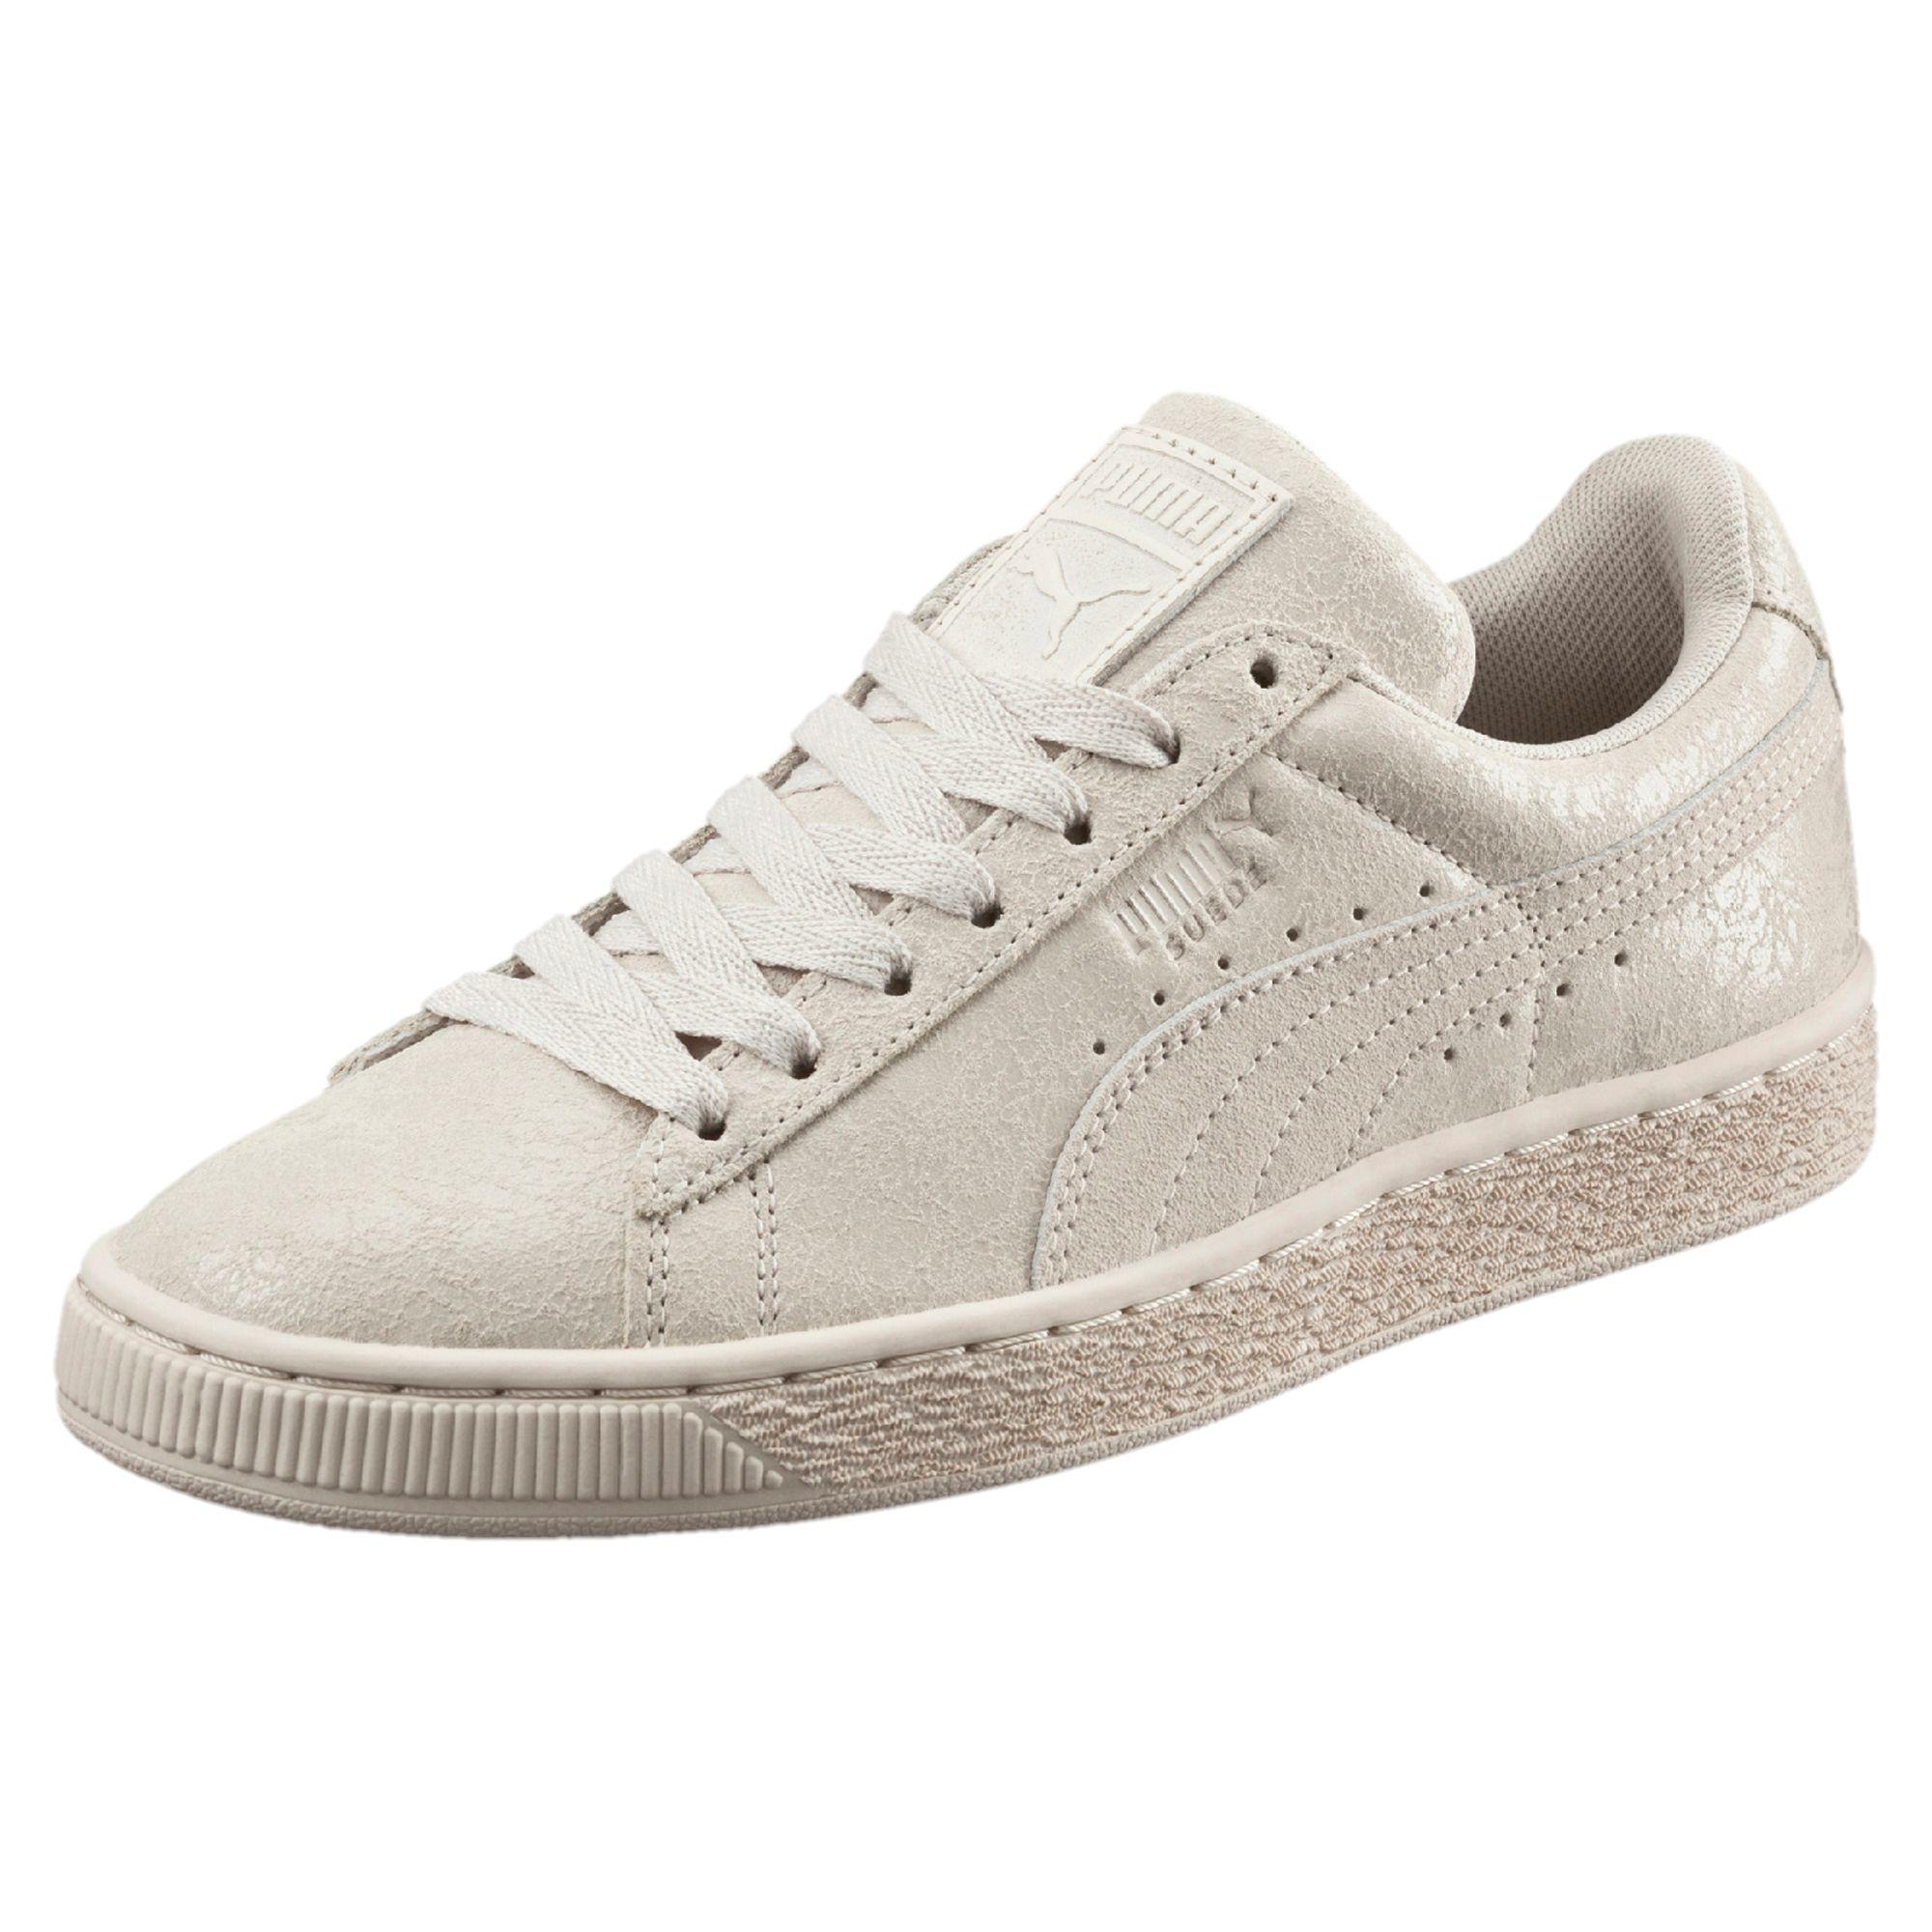 Femmes Daim Remaster Bas-top Sneakers Puma qTcoDCeic